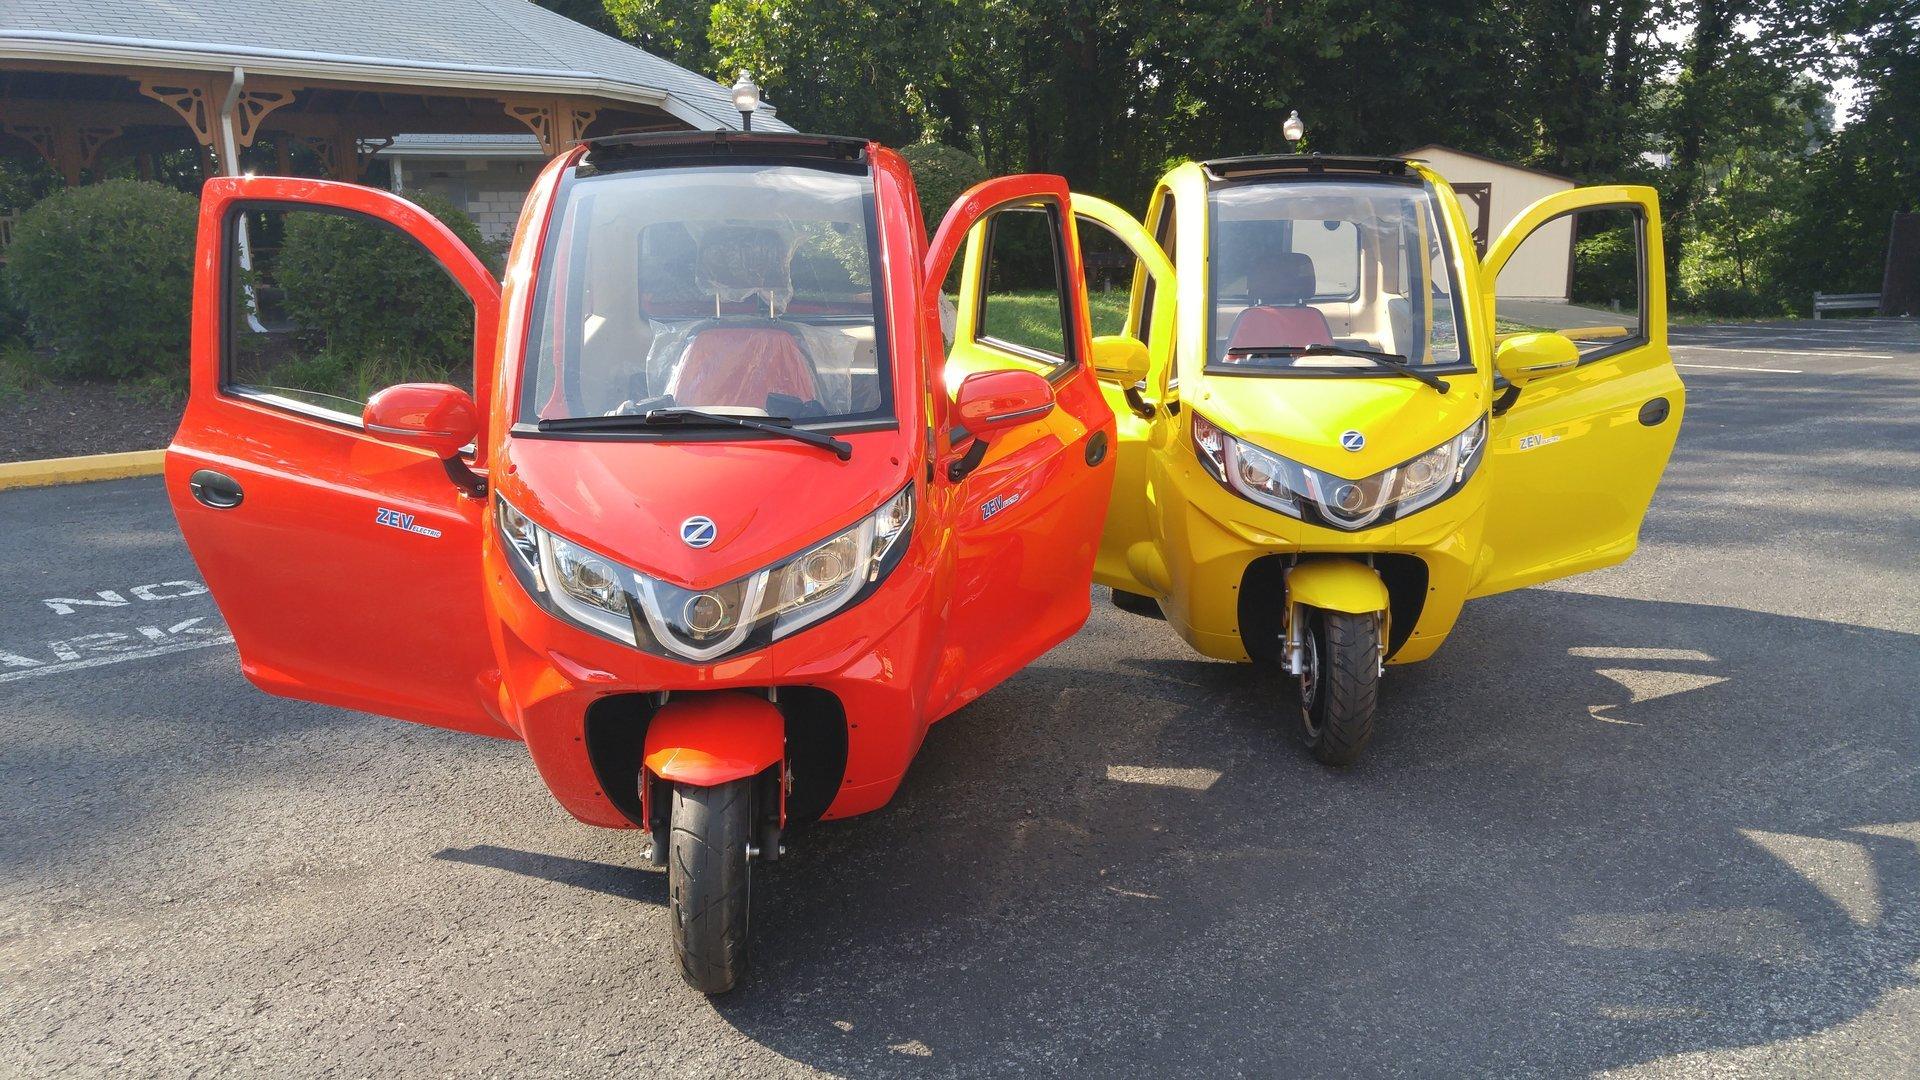 Zev T3 1 Micro Enclosed Trike